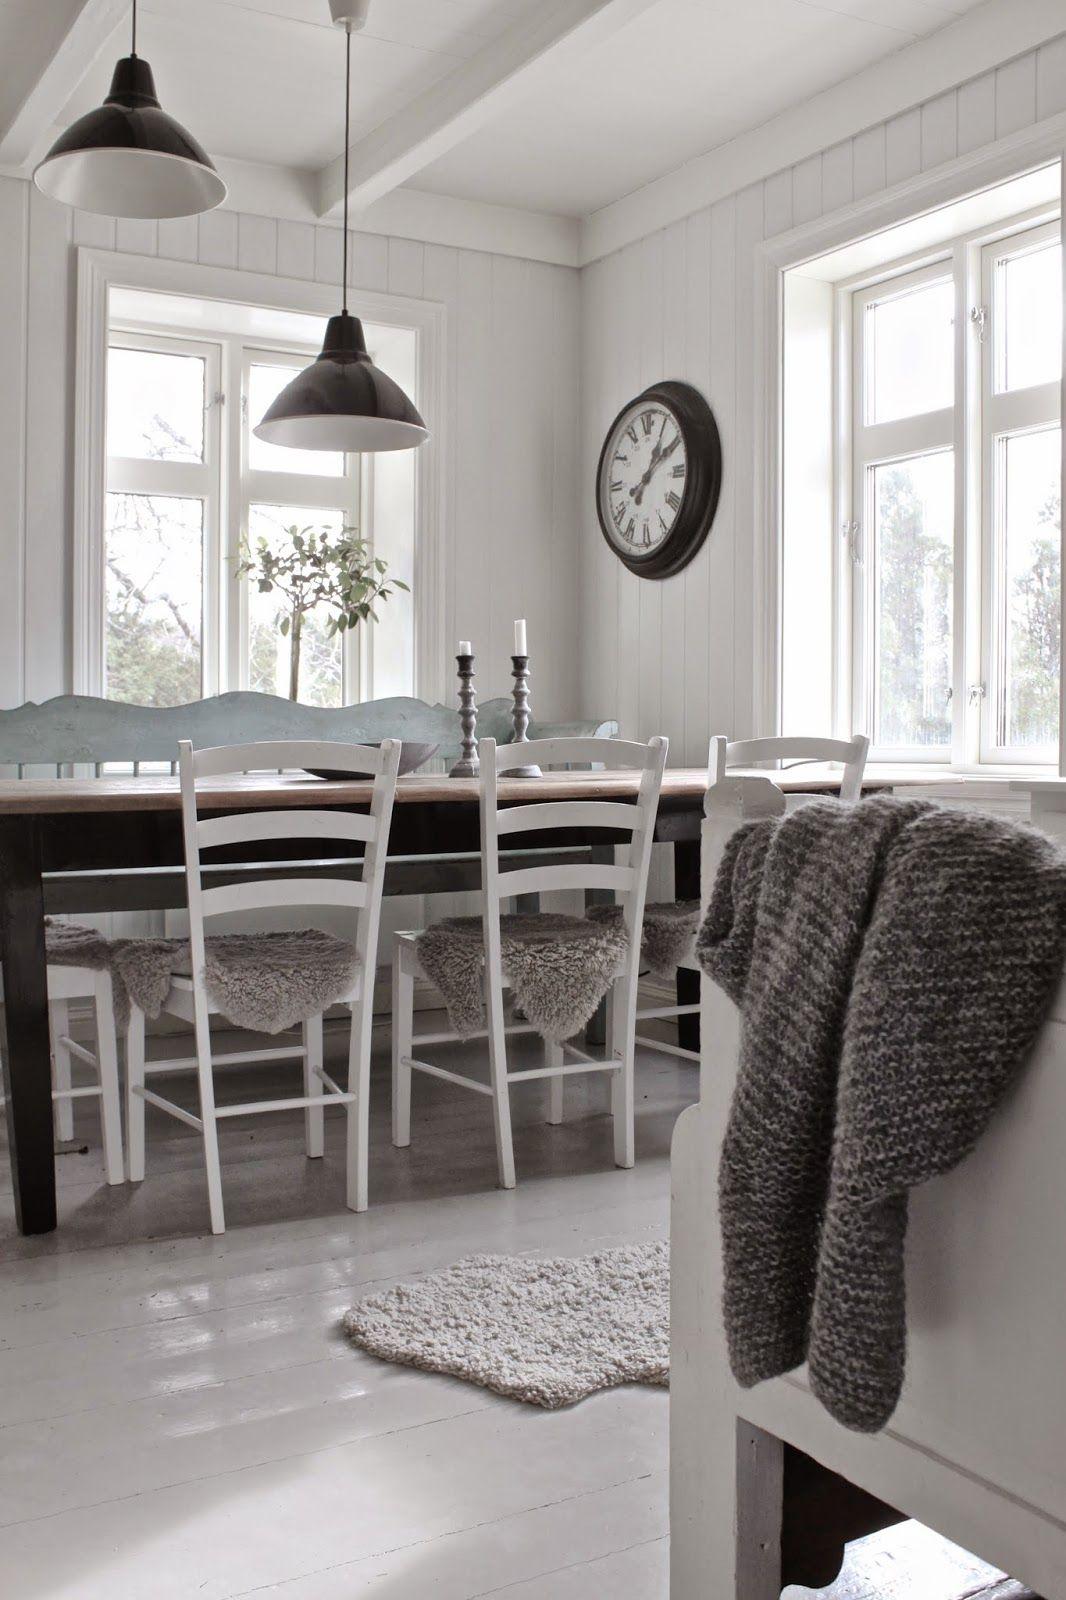 Mias Interiør / New Room Interior